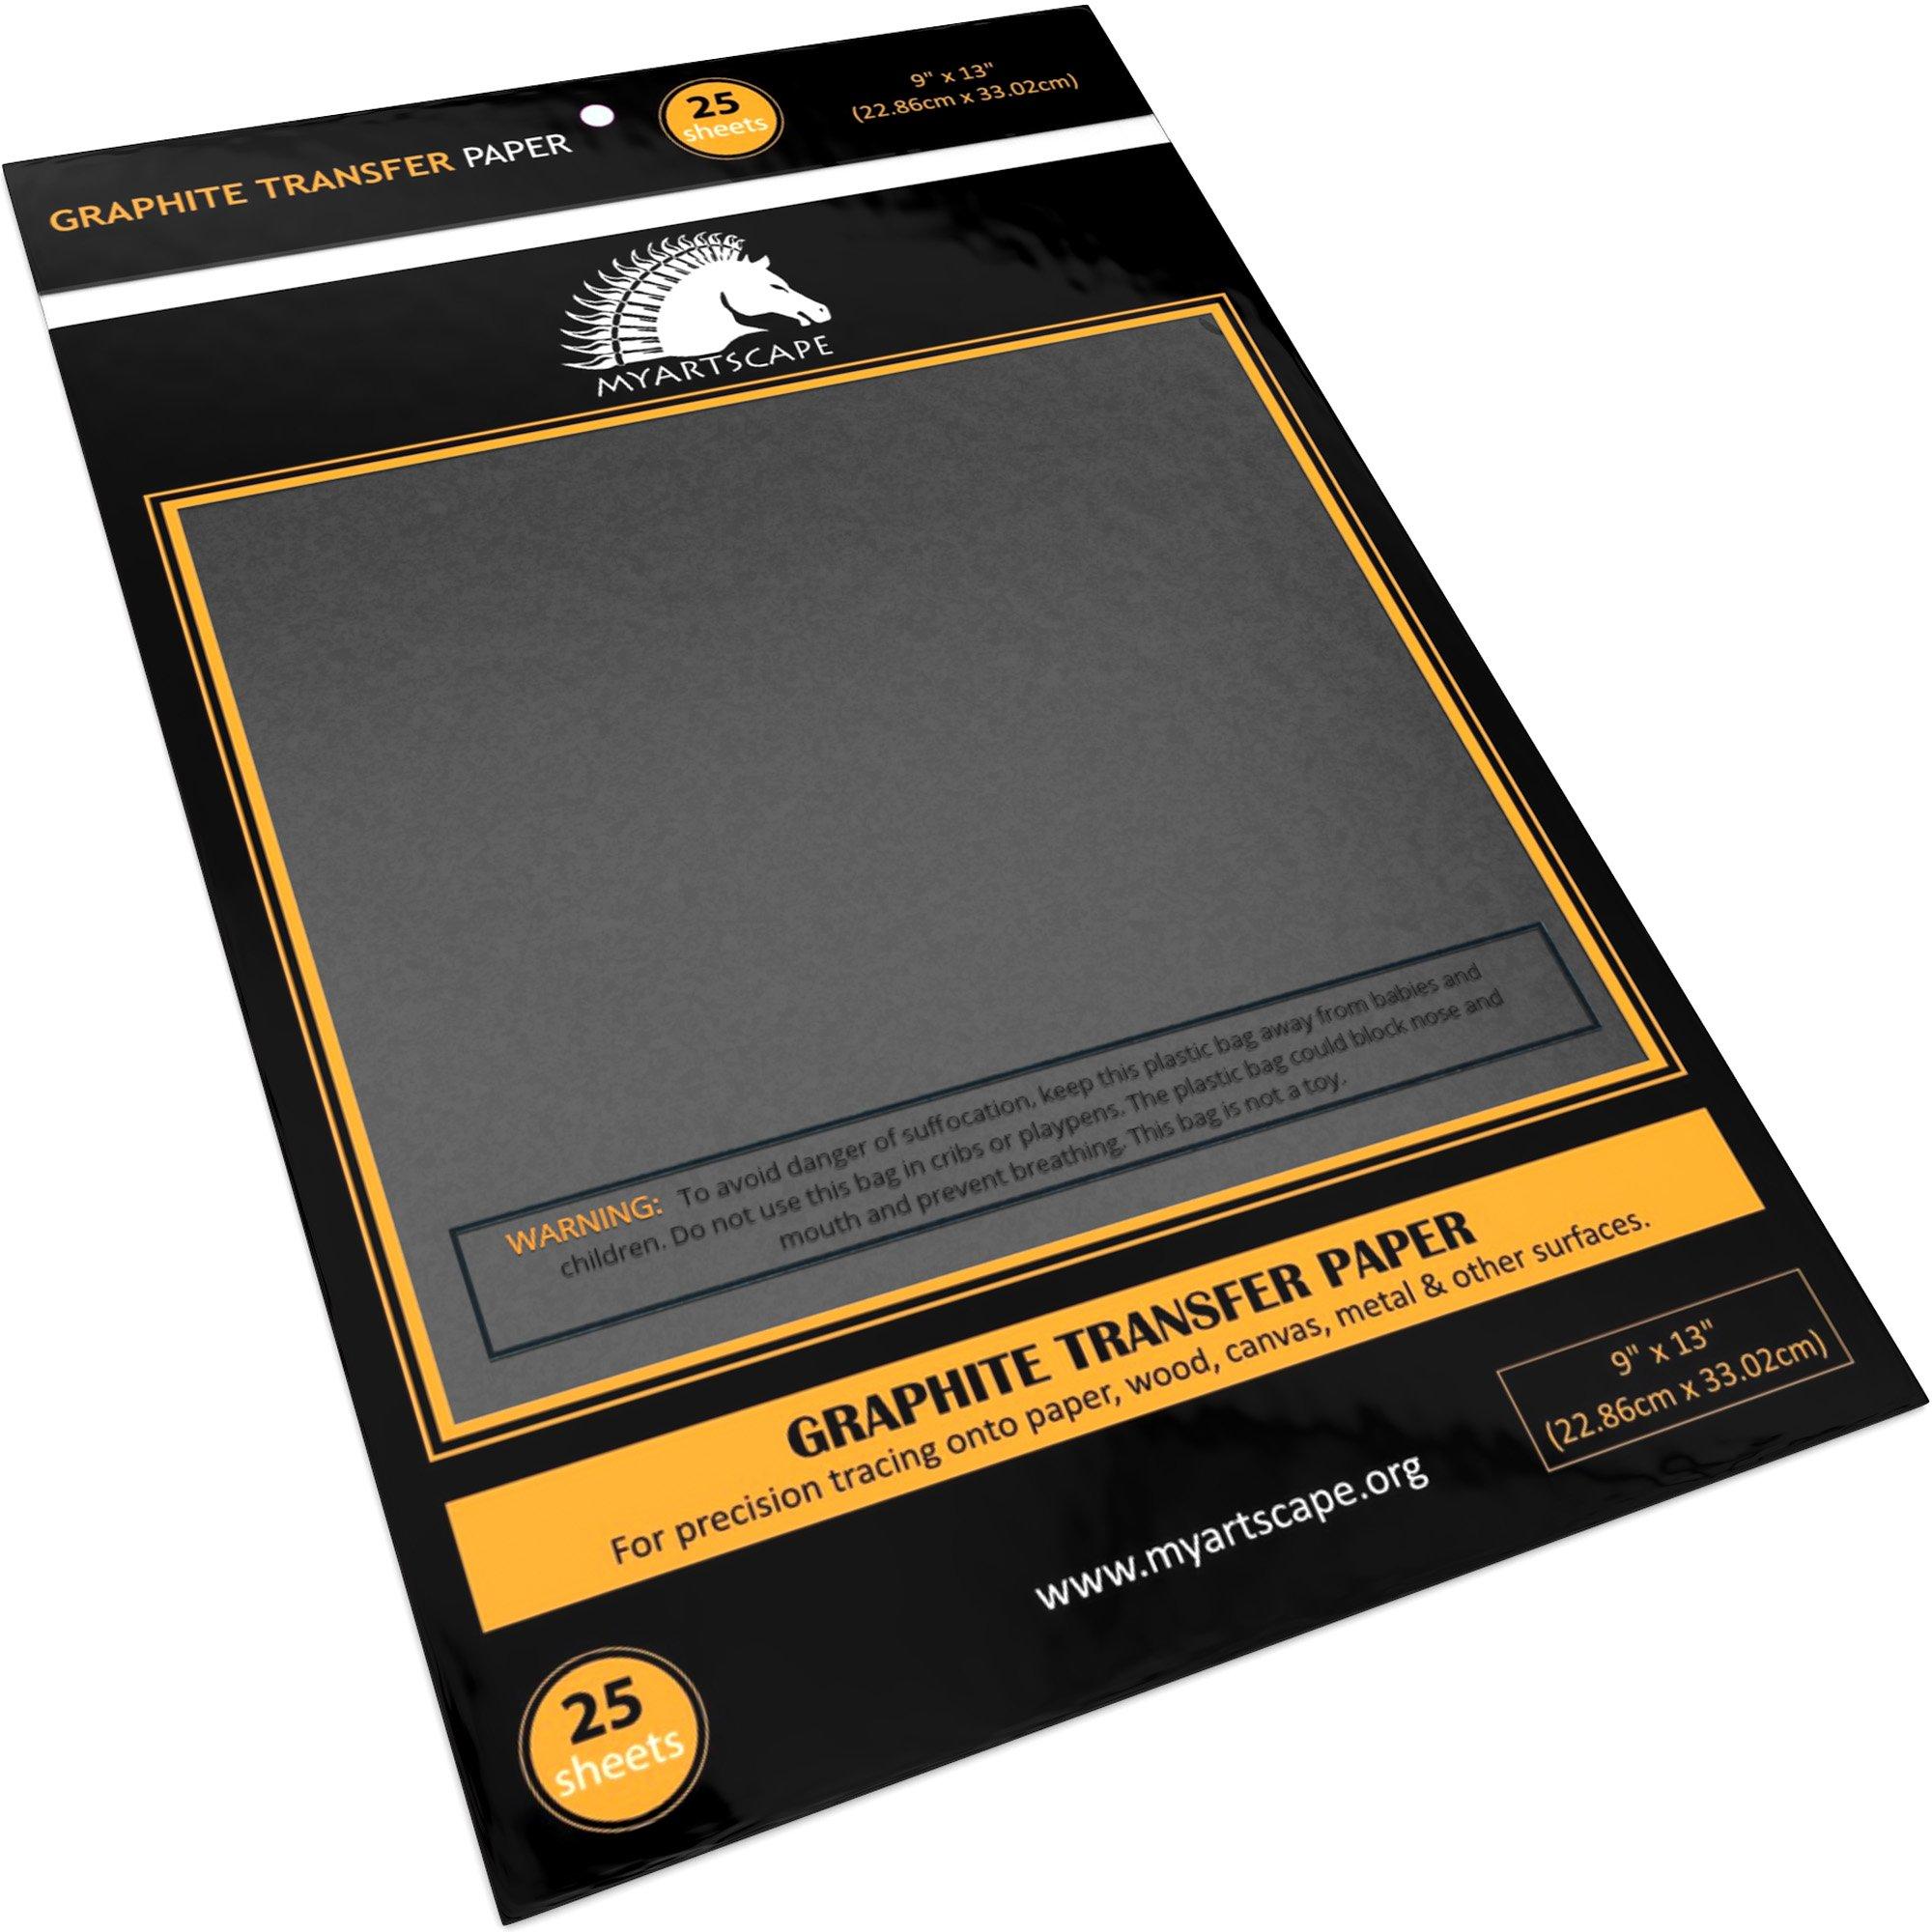 amazon com graphite transfer paper 9 x 13 25 sheets waxed